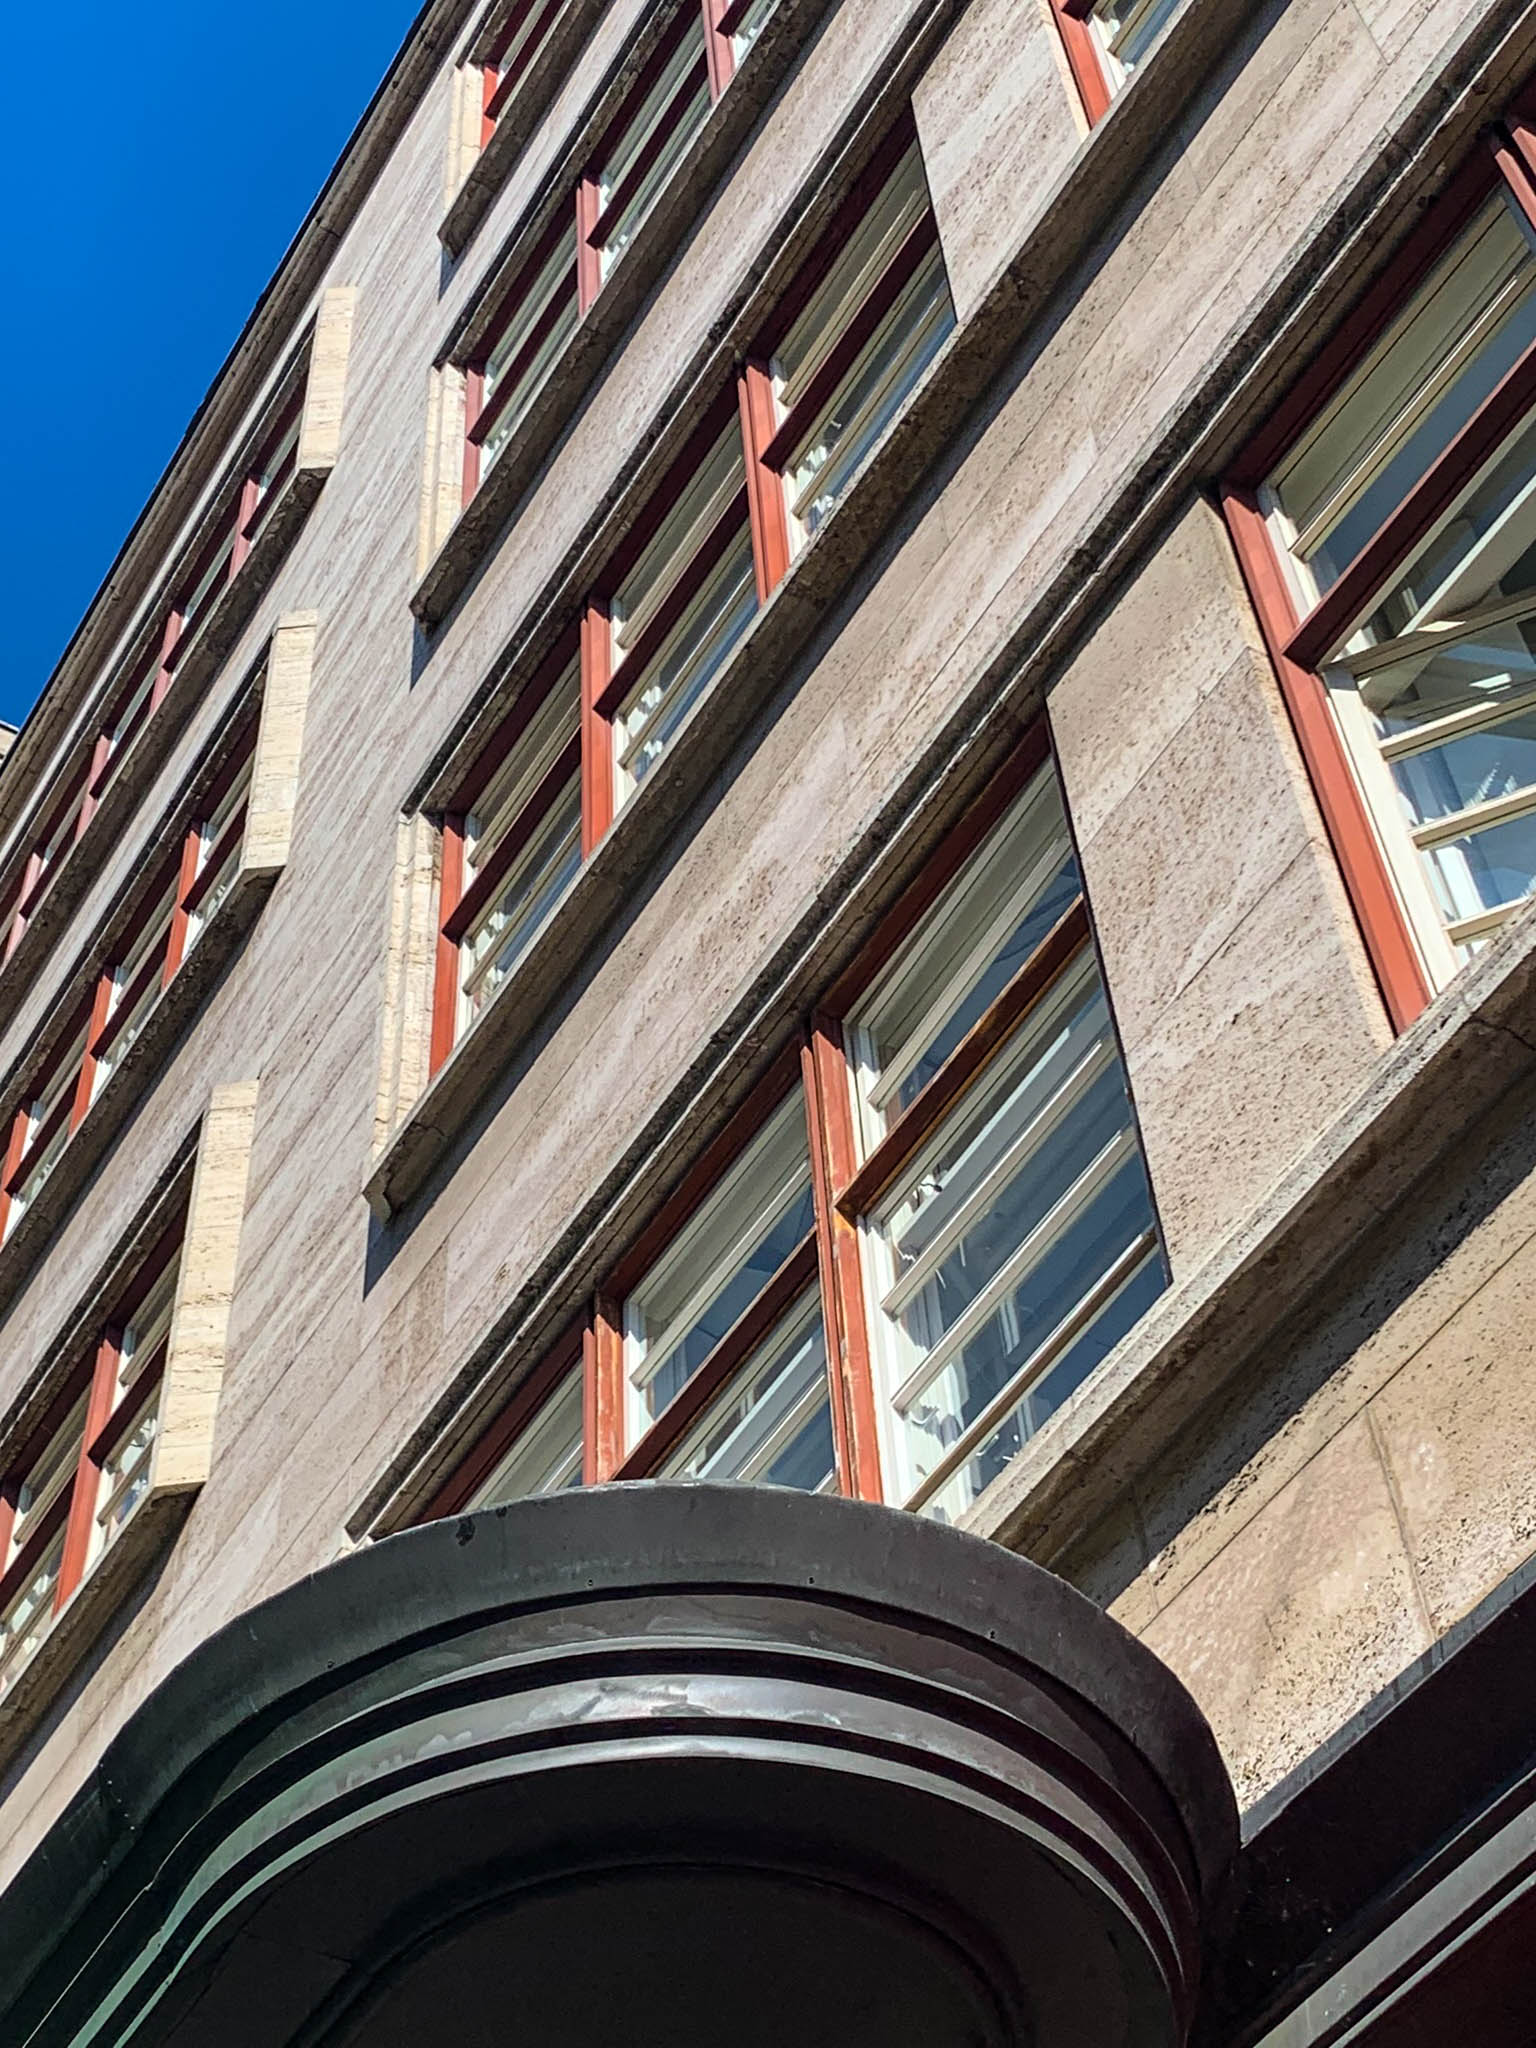 Femina-Palast, 1928-1931. Architects: Richard Bielenberg, Josef Moser